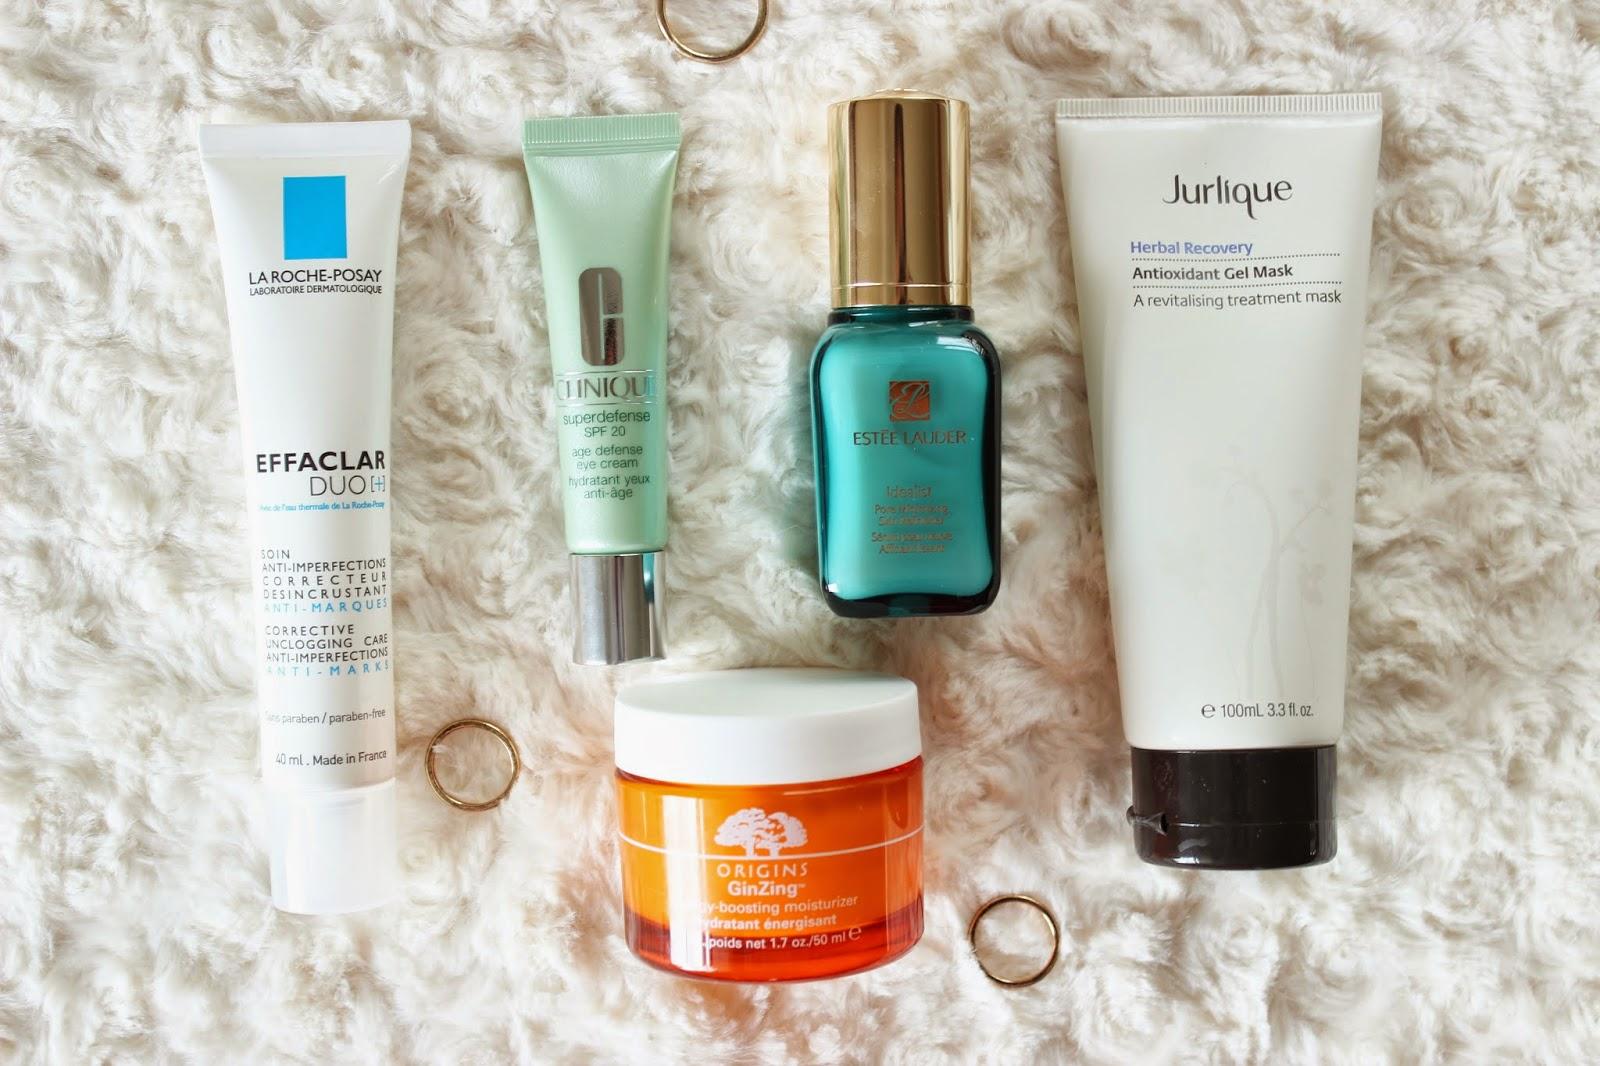 Beauty Post Holiday Sos Skincare Skin Refinisher La Roche Posay Effaclar Duo Anti Blemish Cream Clinique Superdefense Spf 20 Age Defense Eye Estee Lauder Idealist Pore Minimizing